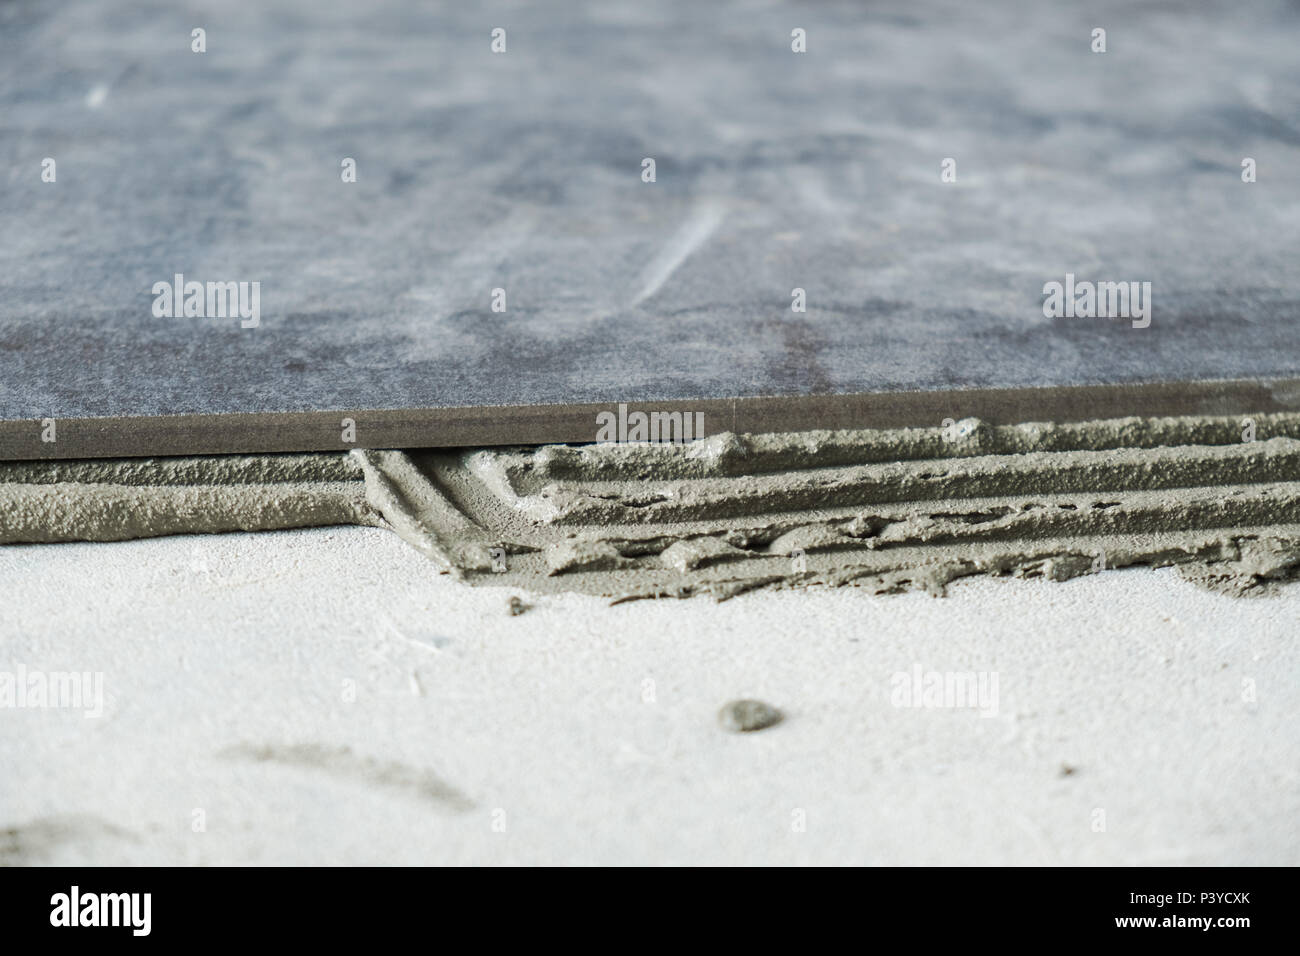 Dark Grey Ceramic Floor Tiles Laid On Applied Adhesive Stock Photo